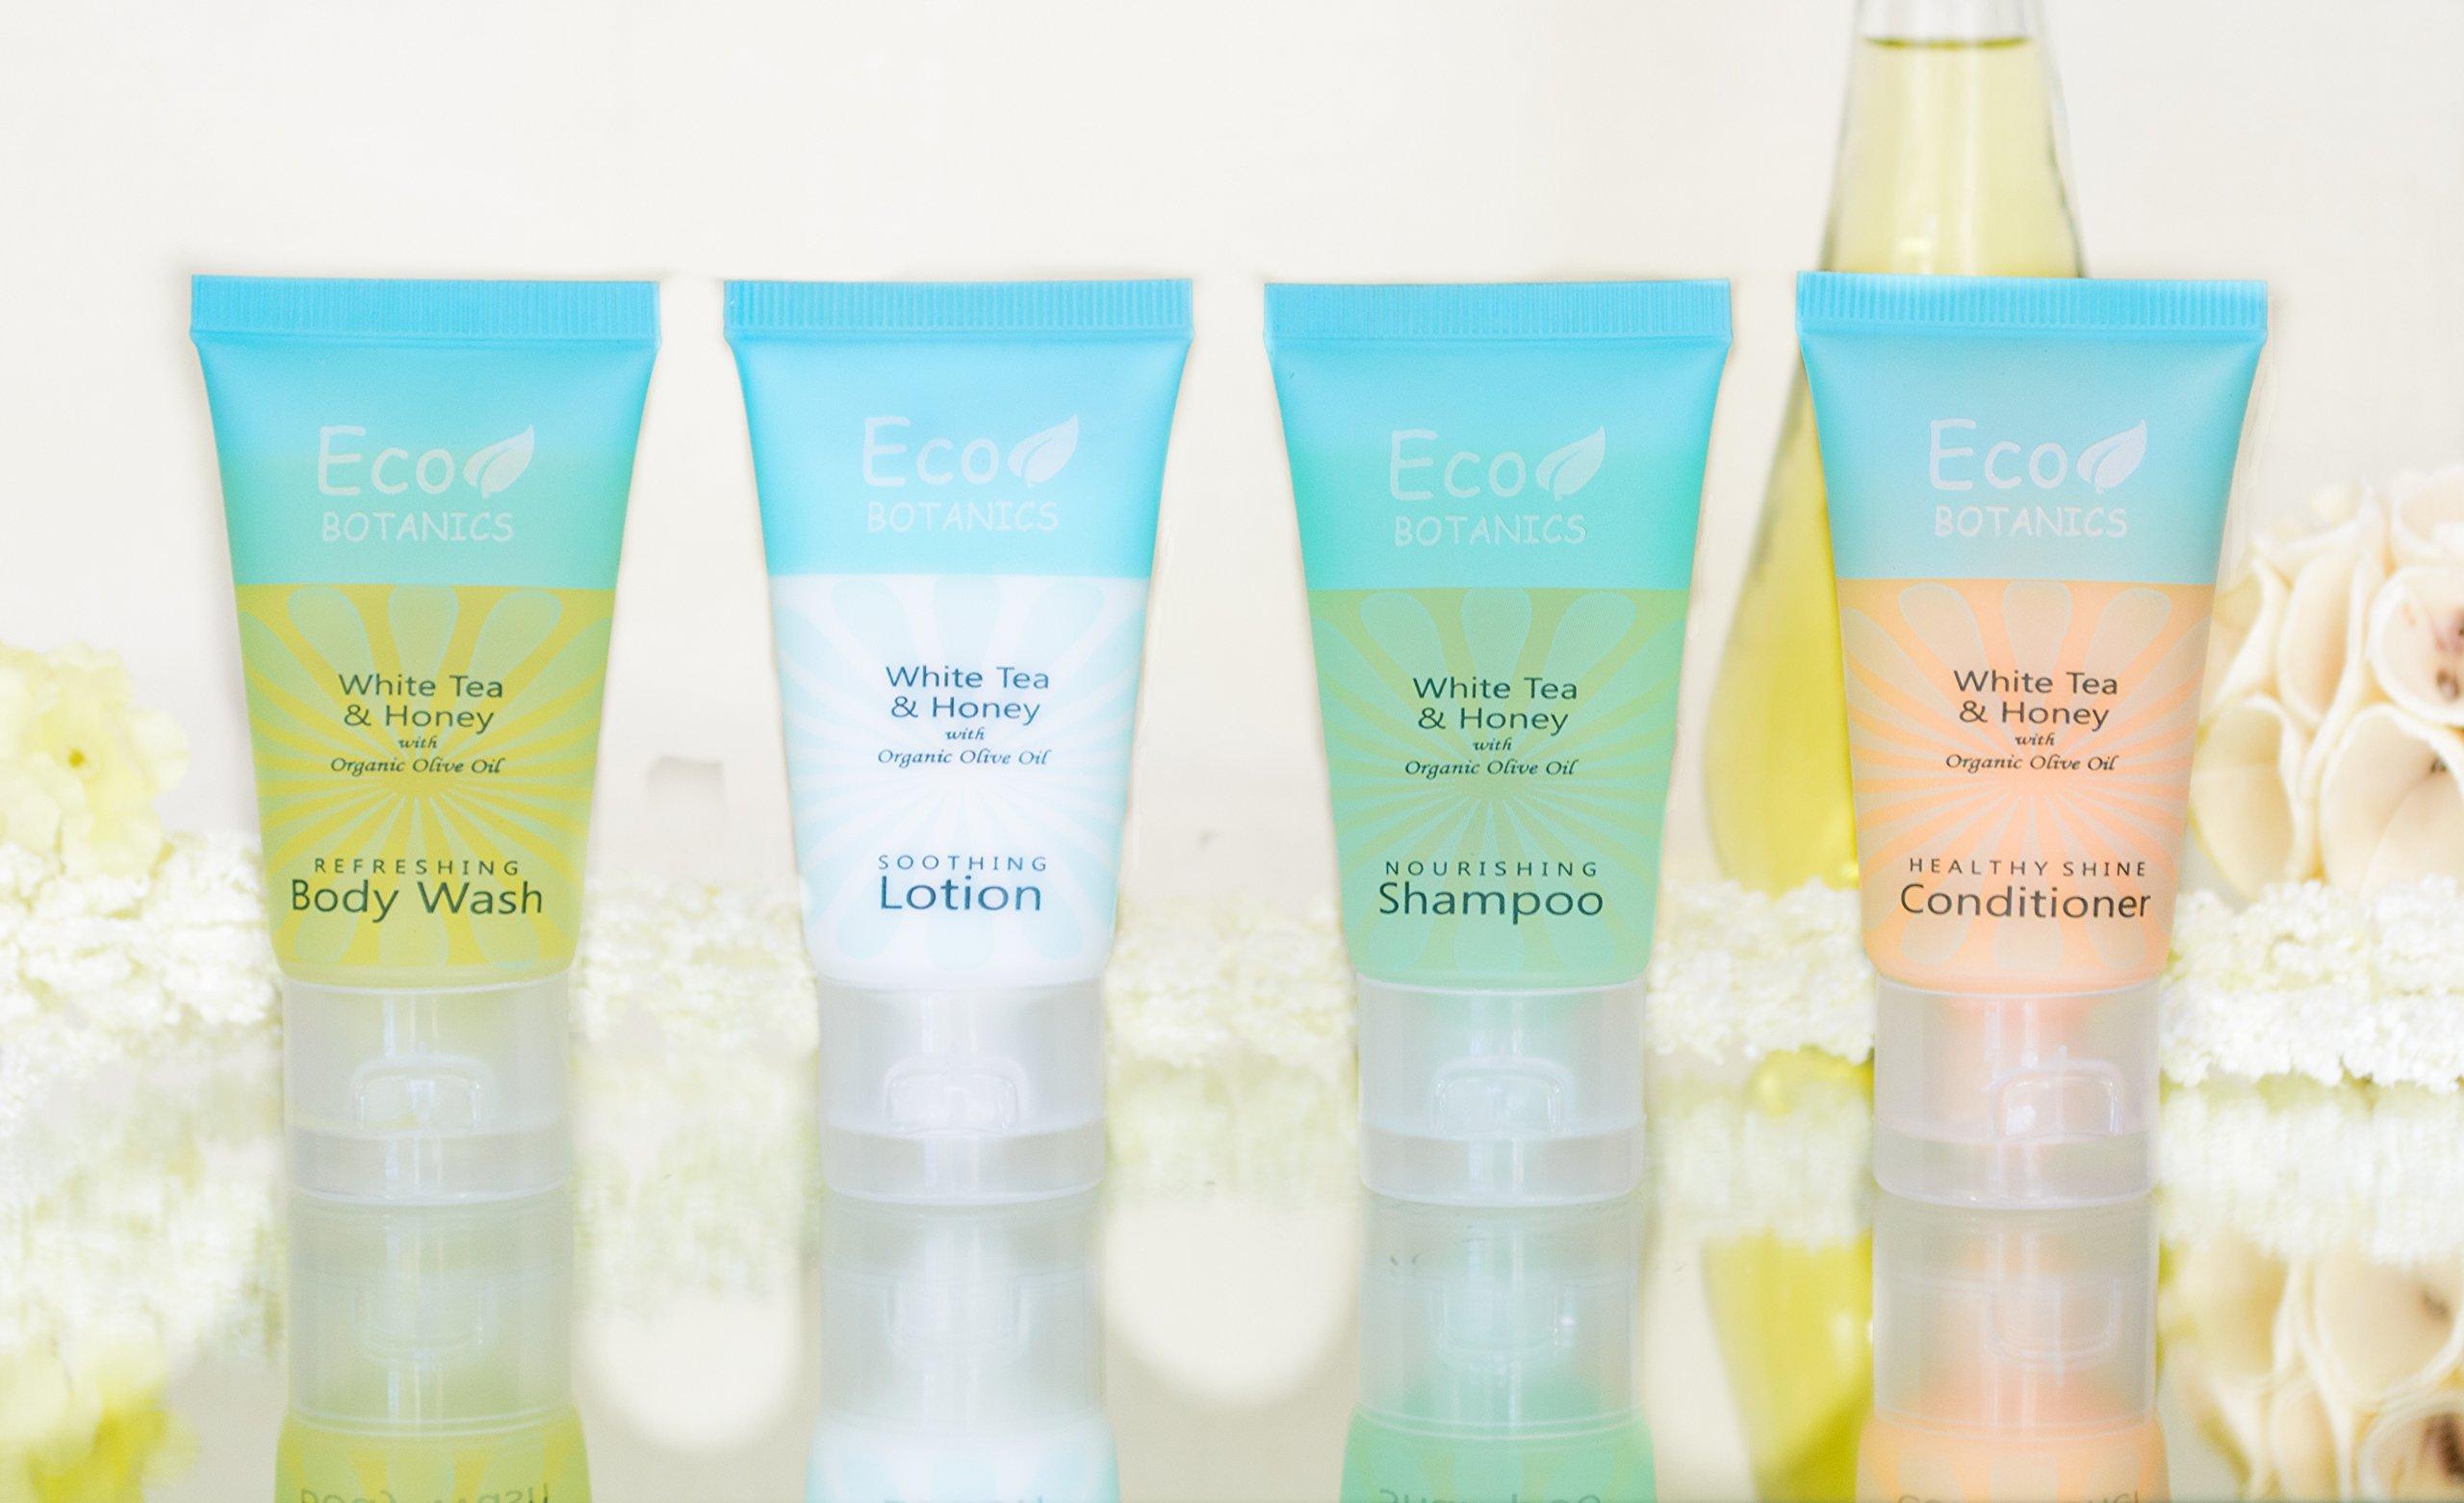 Eco Botanics Conditioner - other products